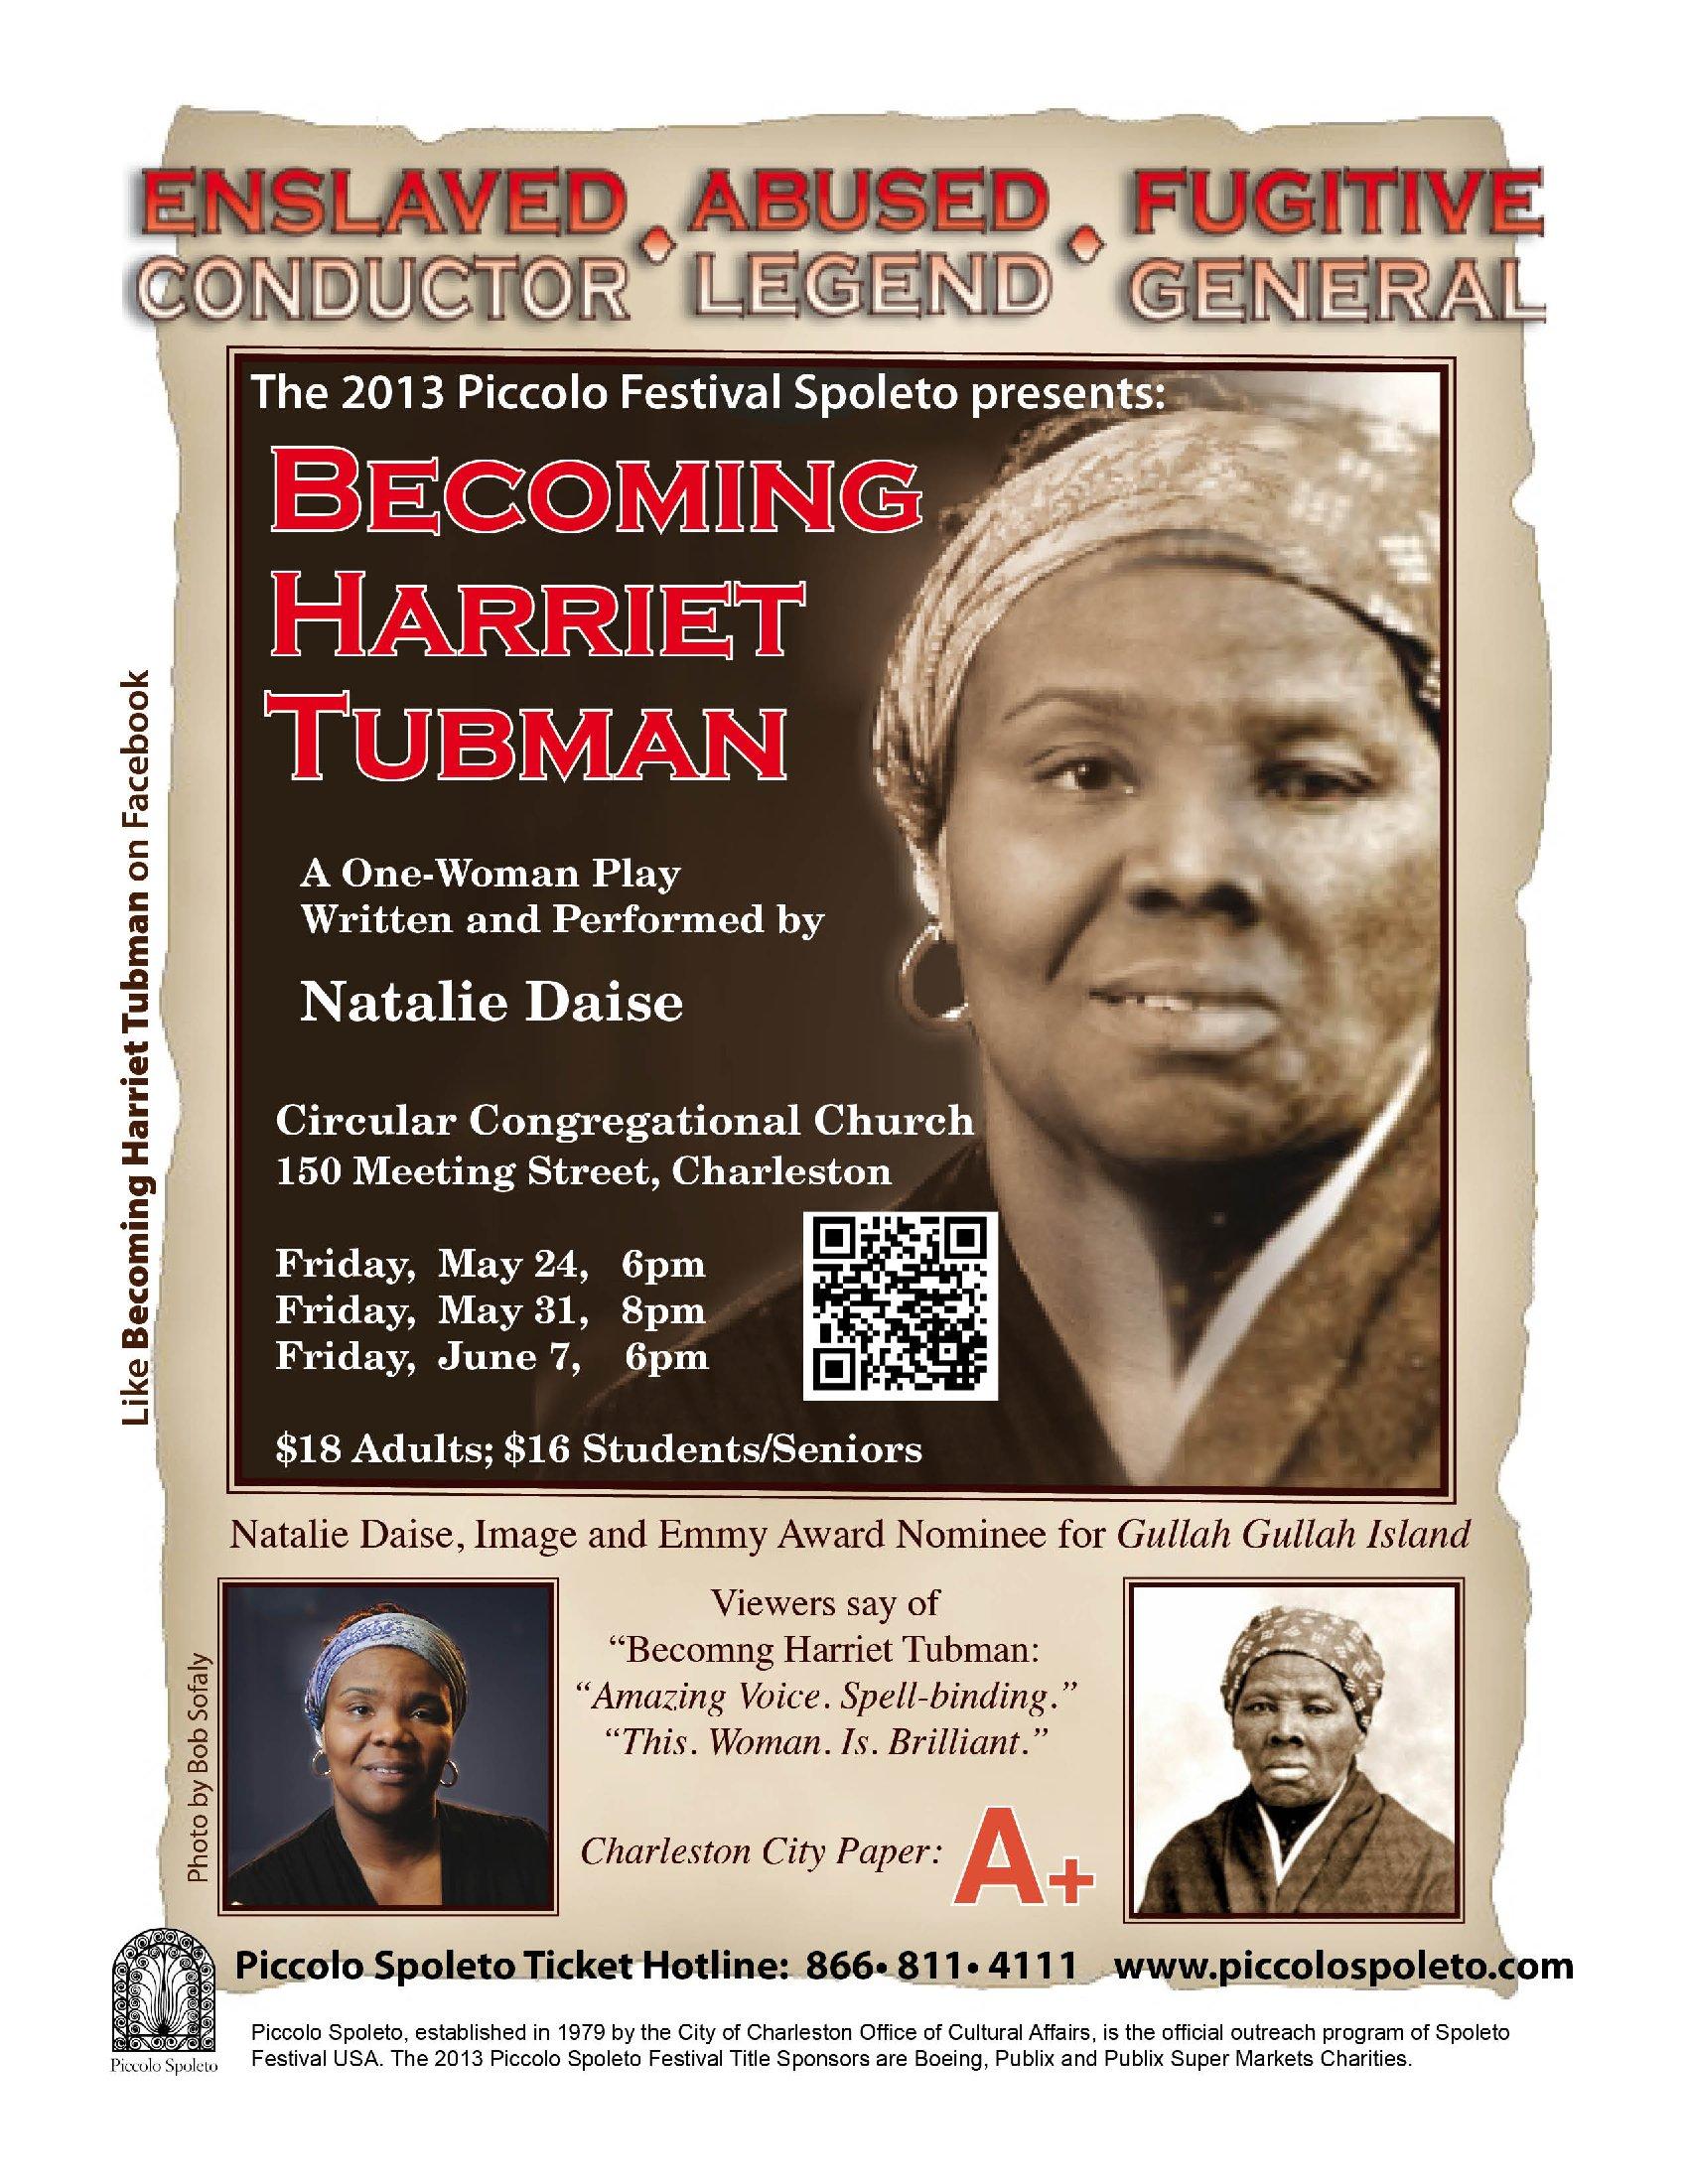 Natalie Daise Becoming Harriet Tubman